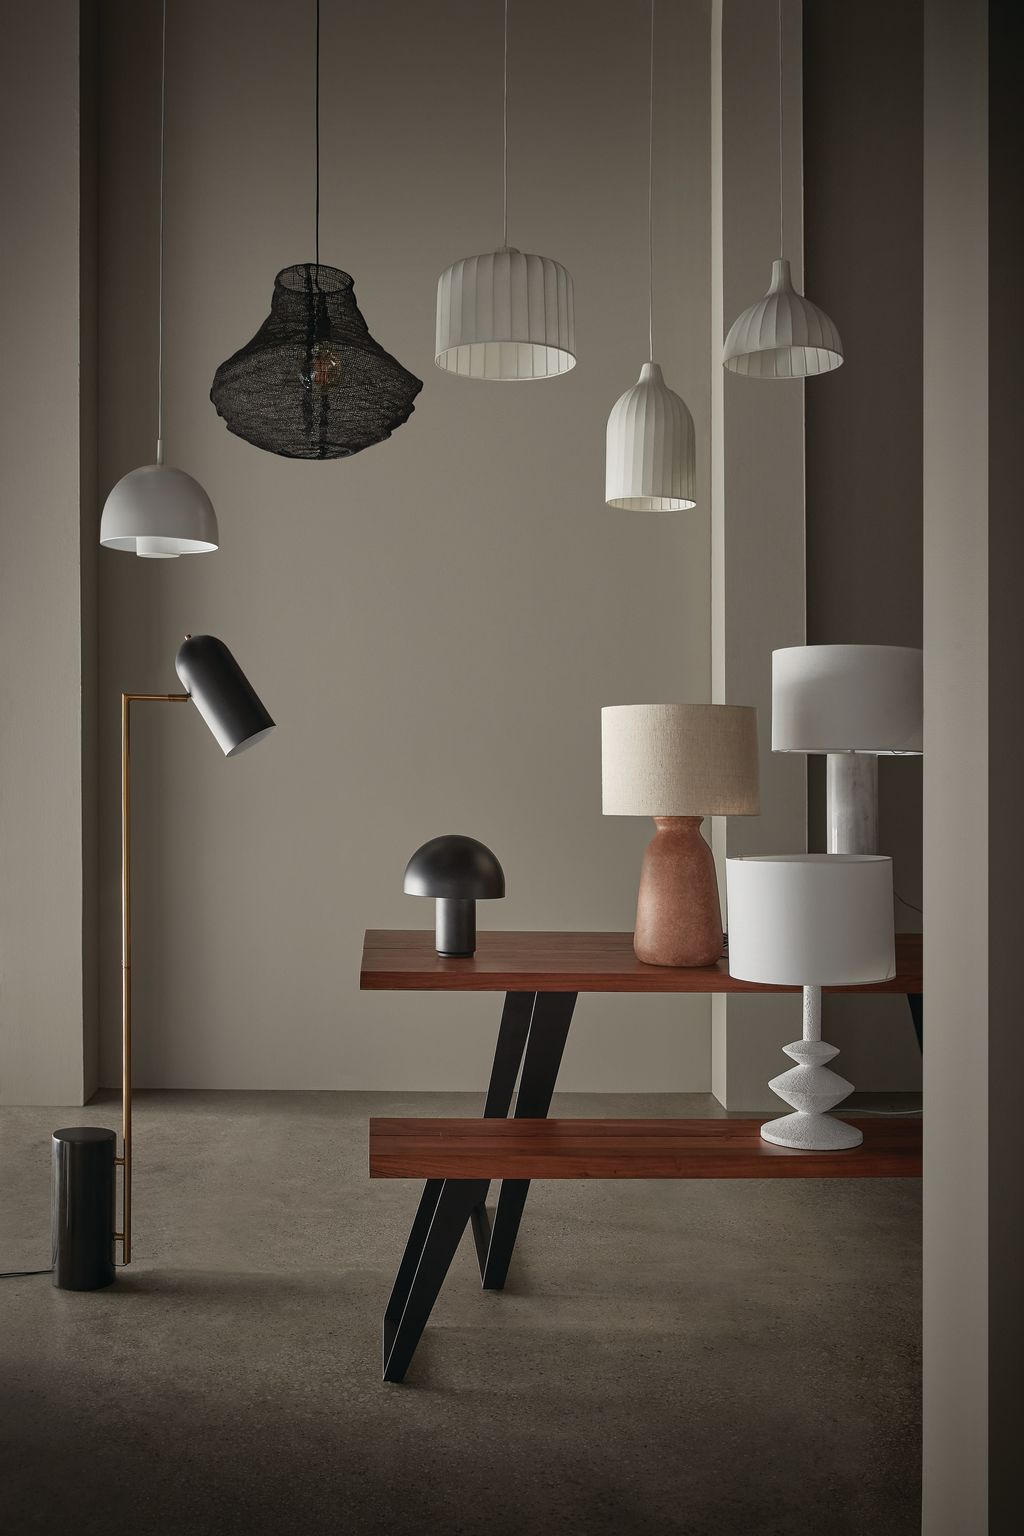 Freedom furniture lighting